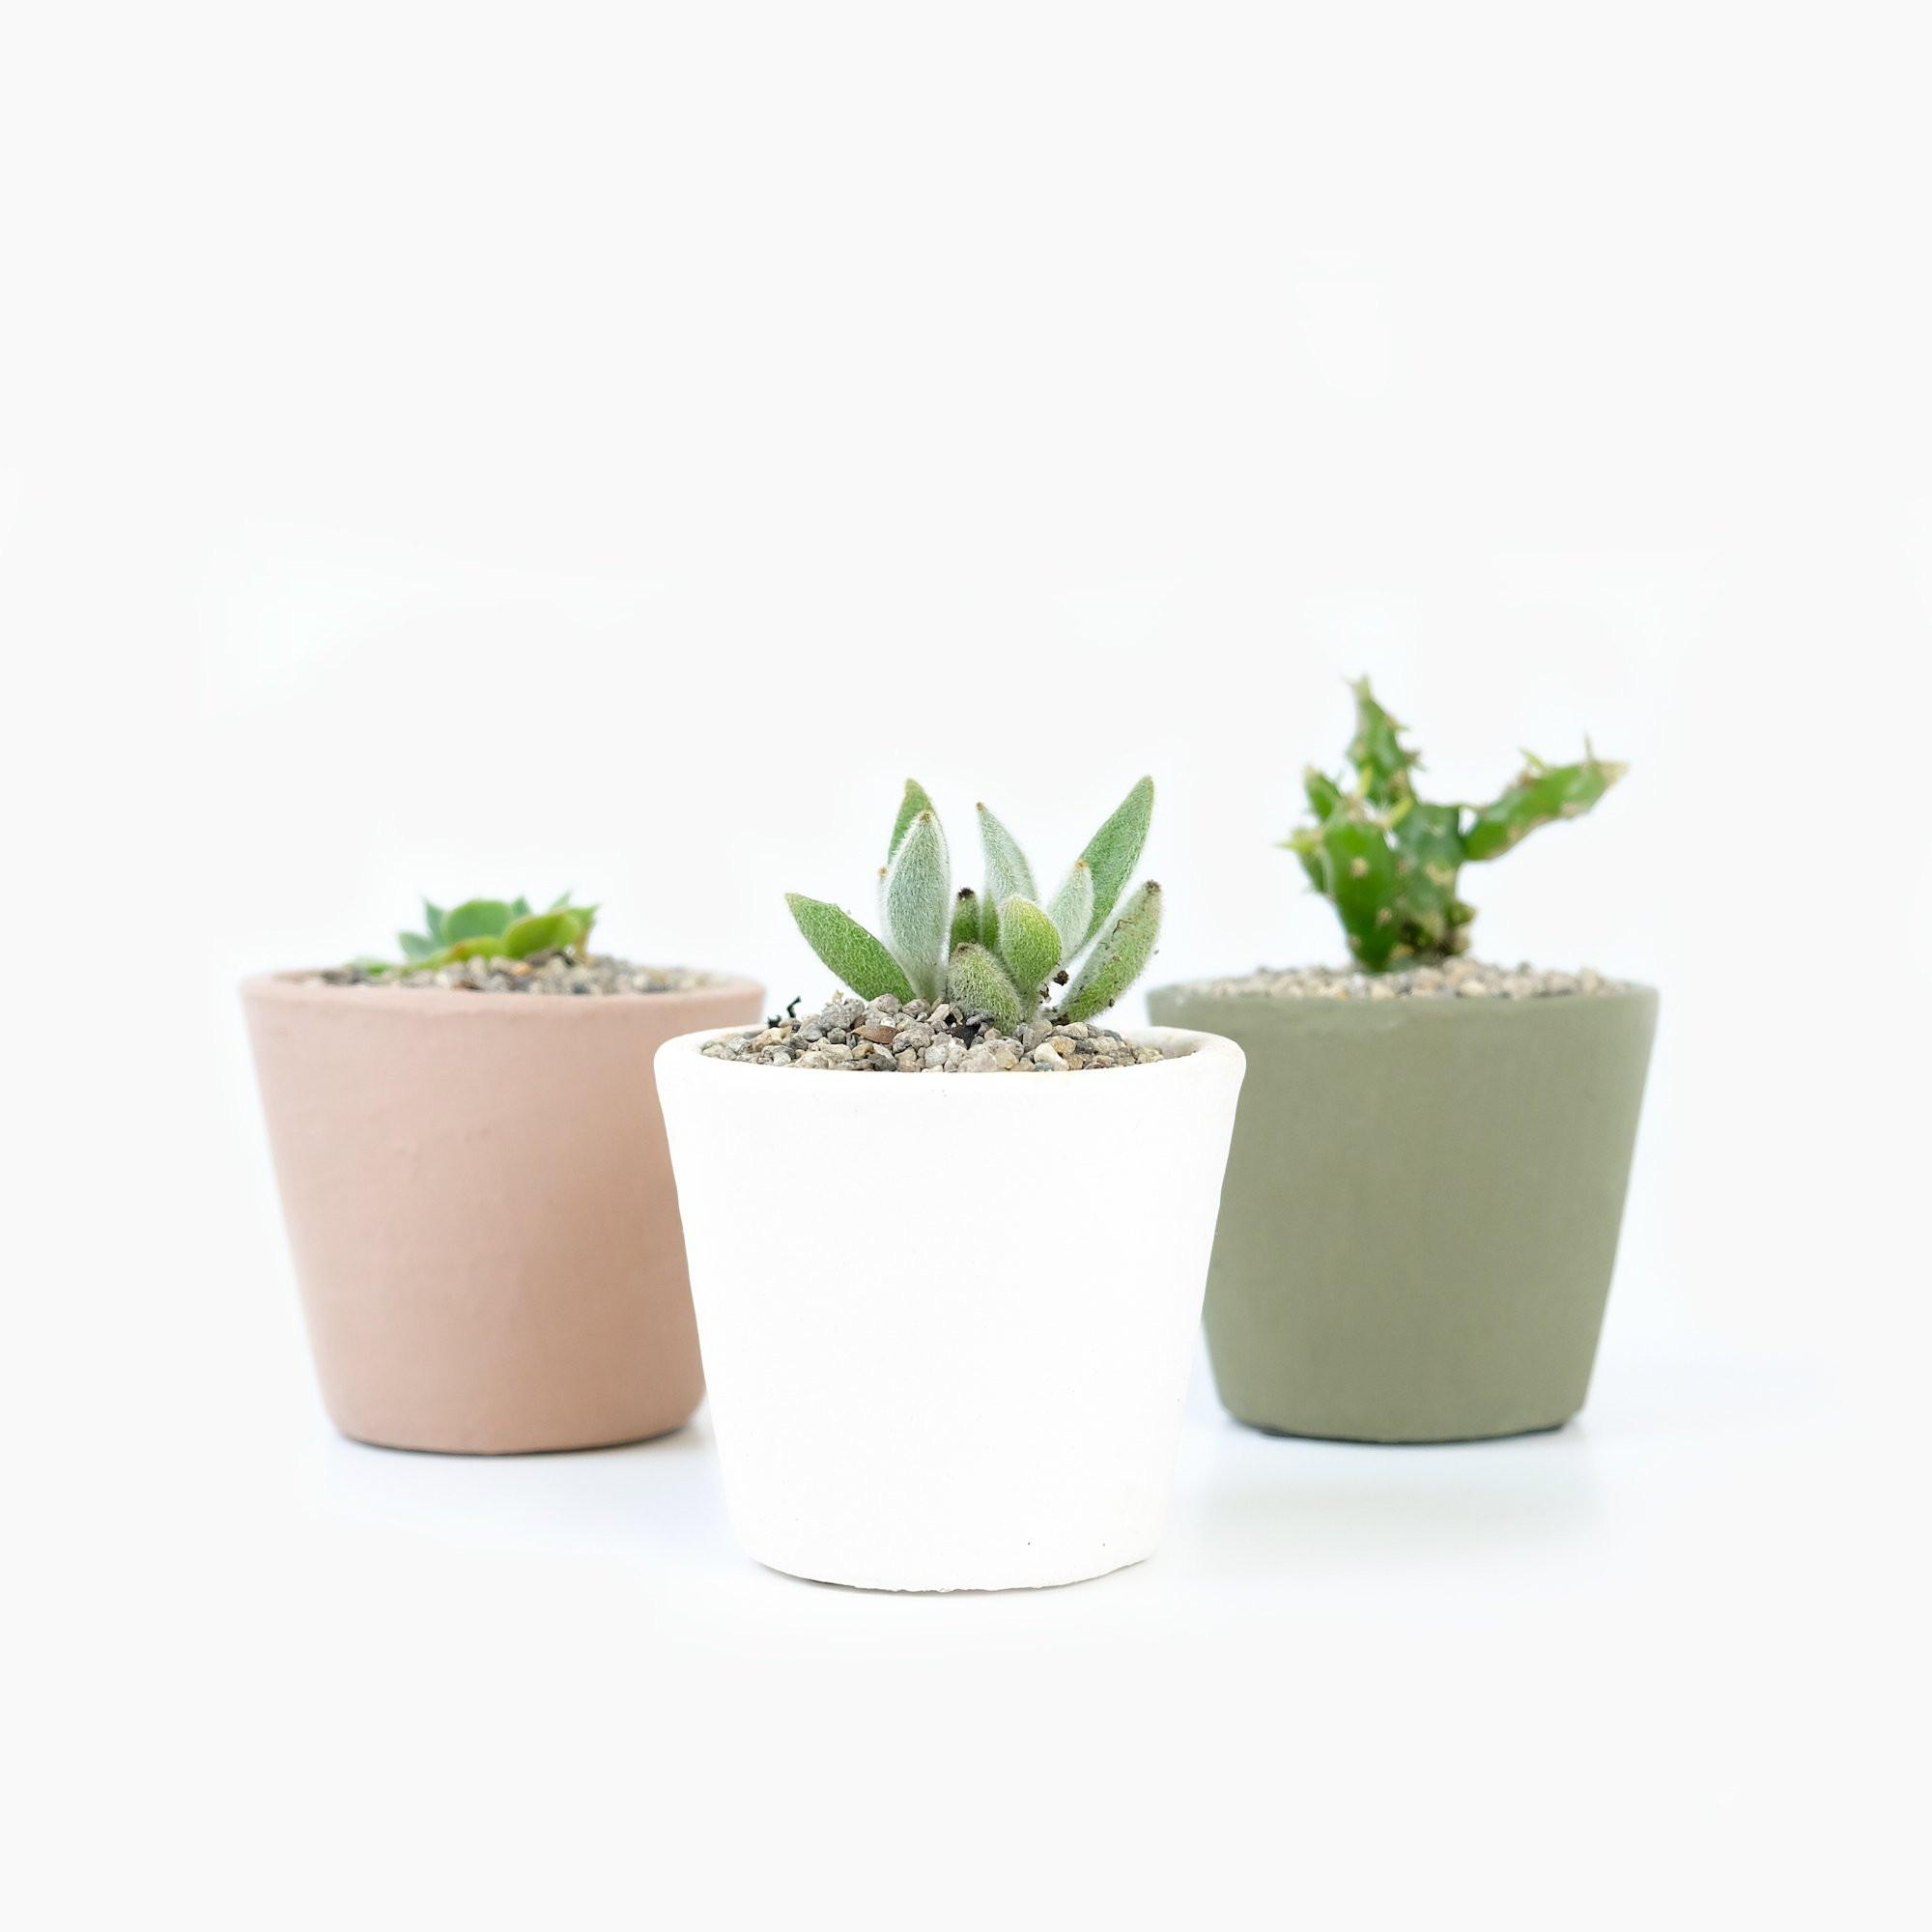 serax cactus vase of serax stoneware flower pots nude nz stockist shop online within serax stoneware flower pots nude